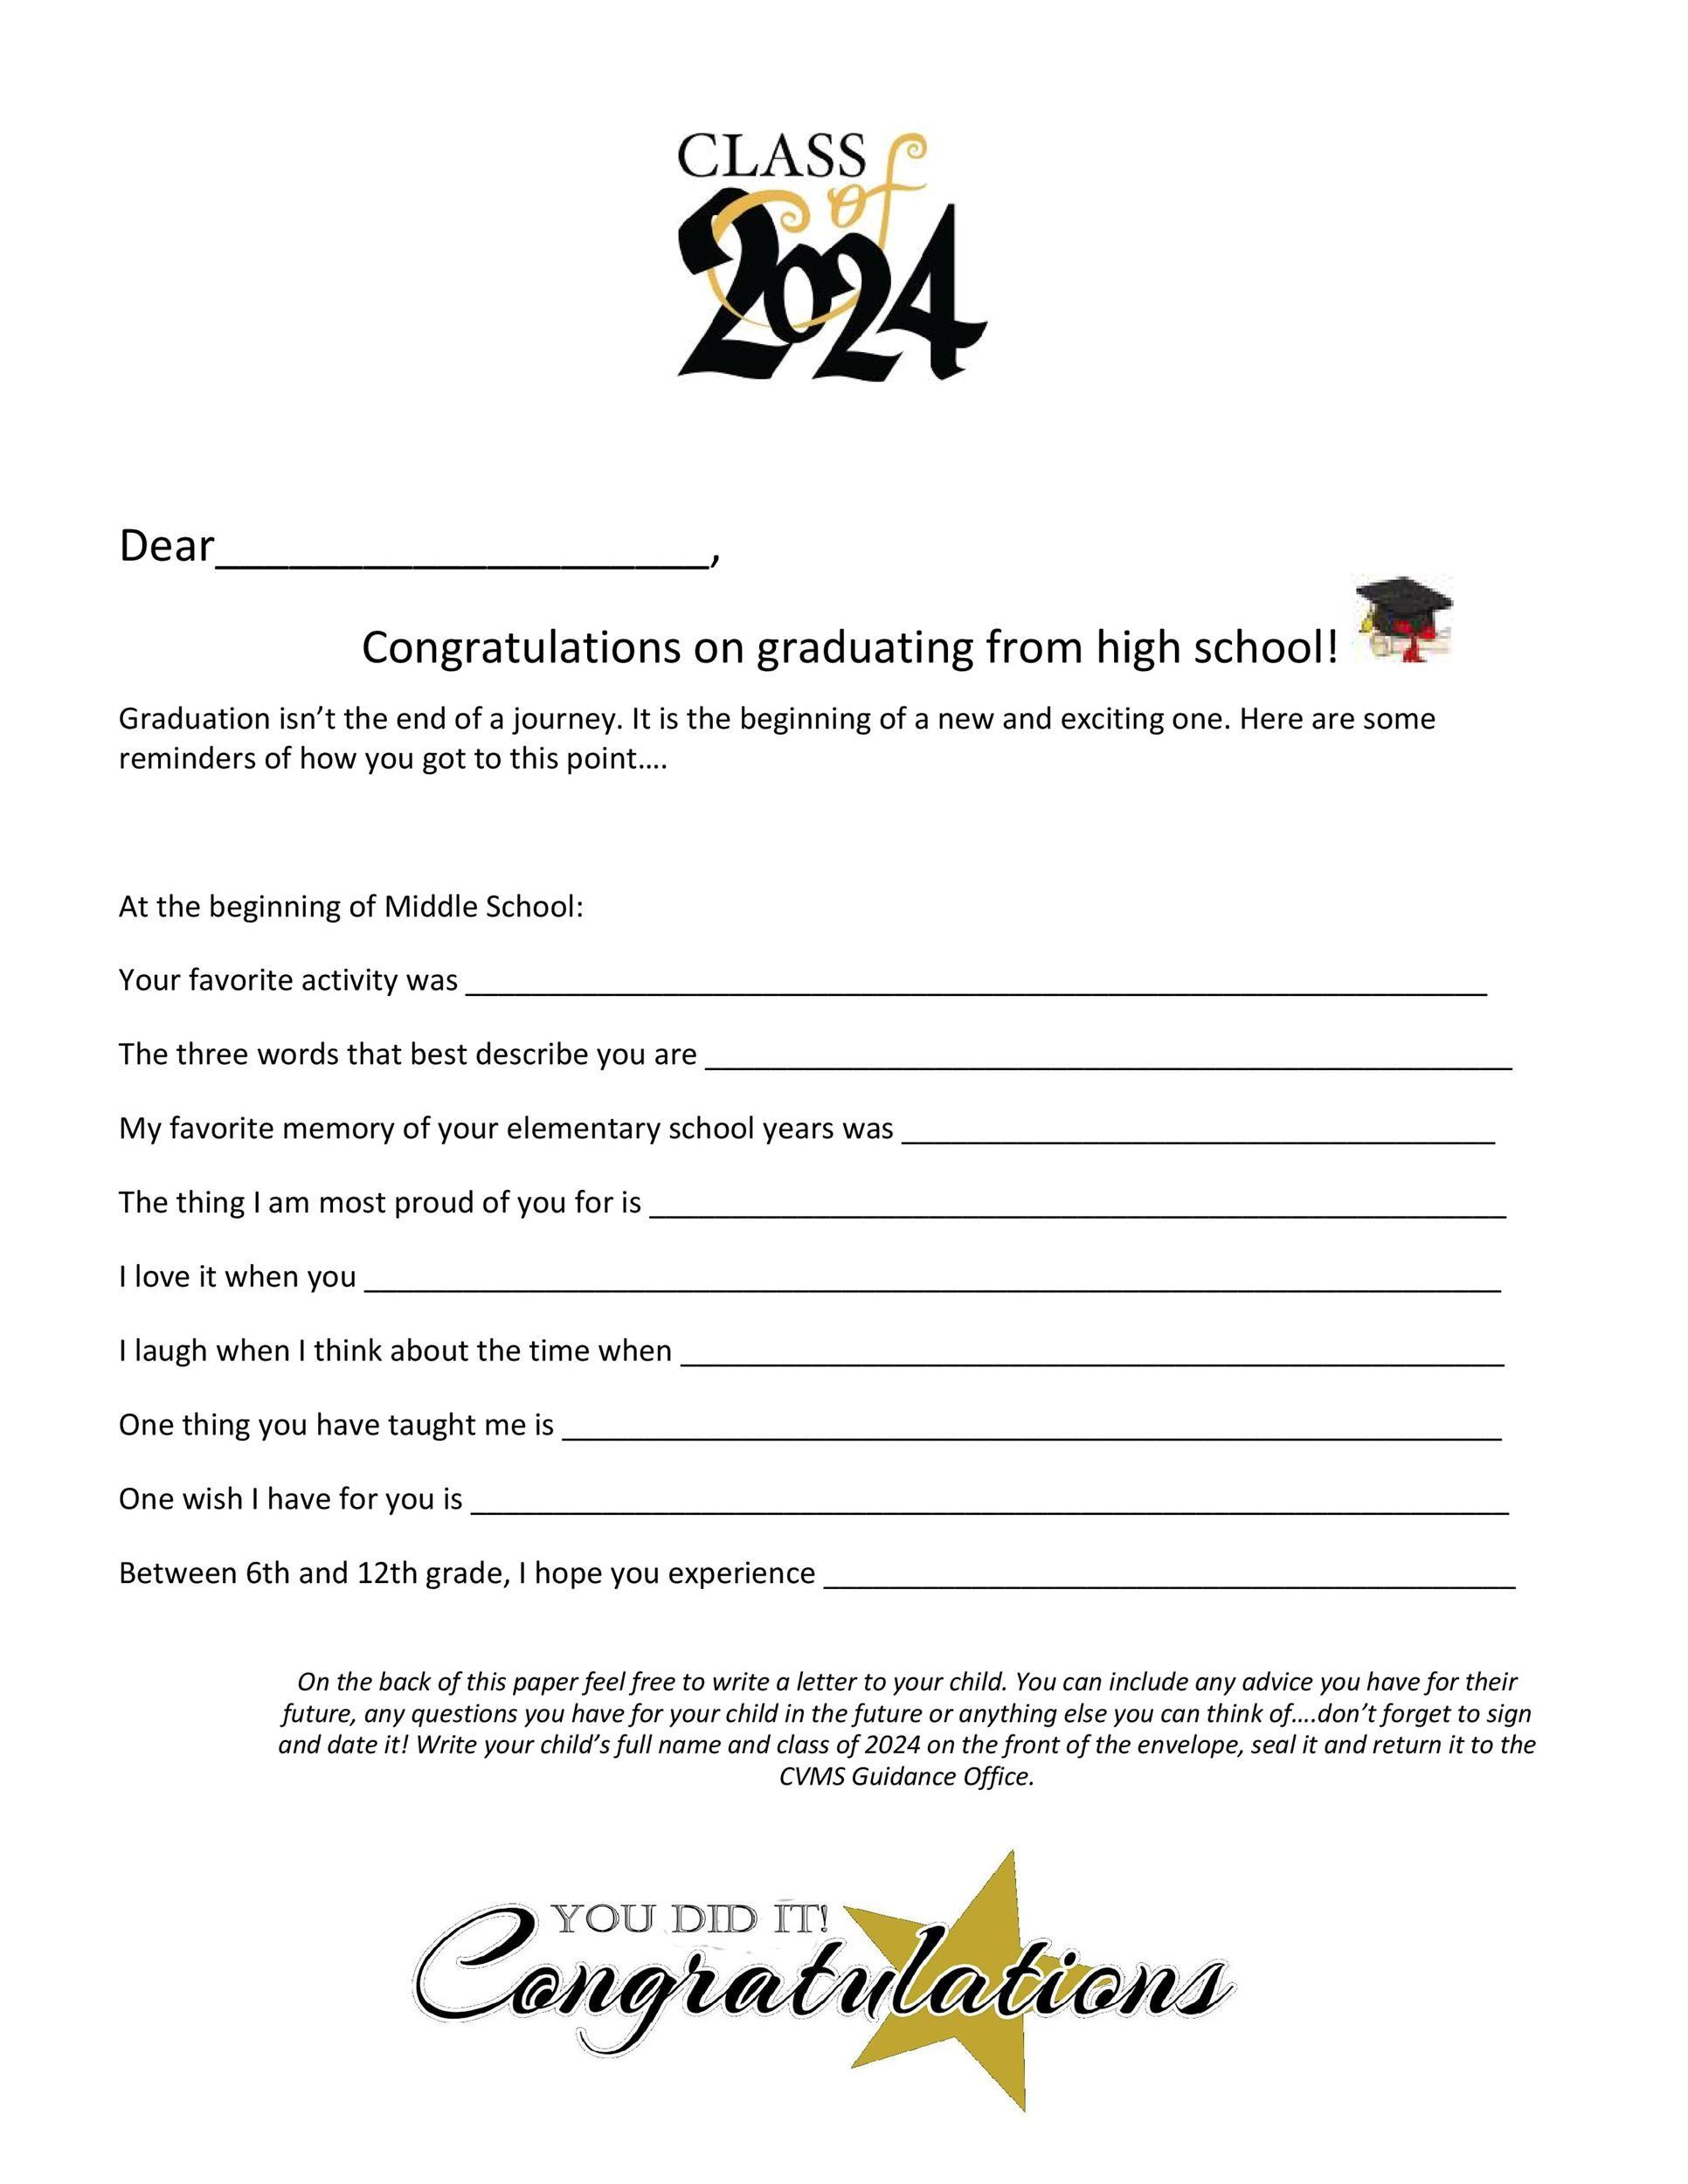 Free congratulations letter 34